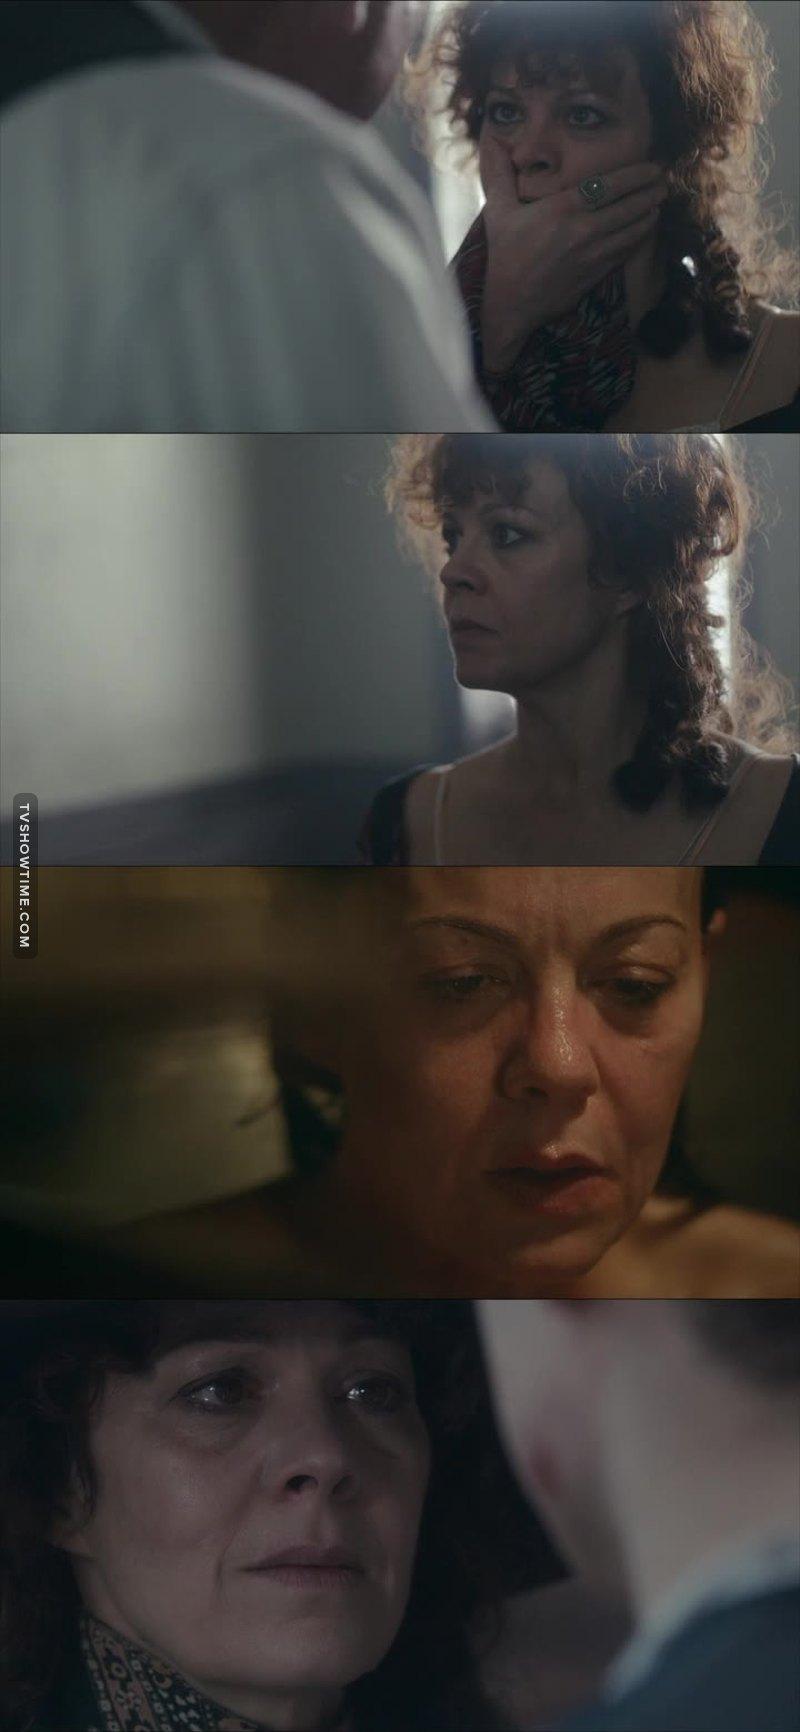 She really is a damn good actress!